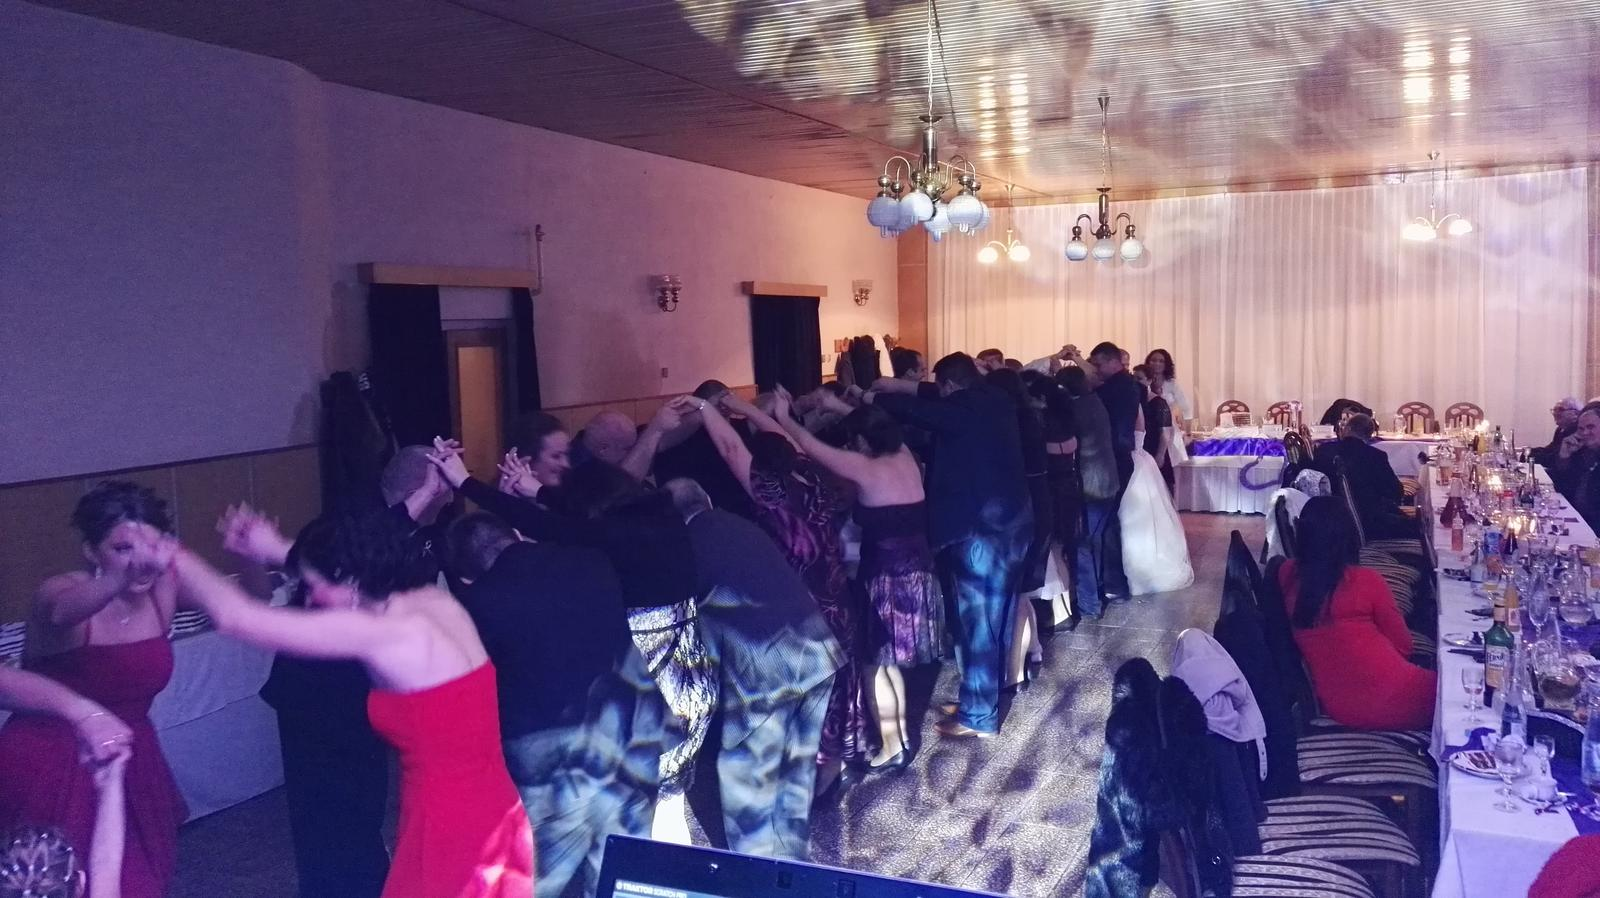 djmarco - Svadba Vináreň Drevaňa